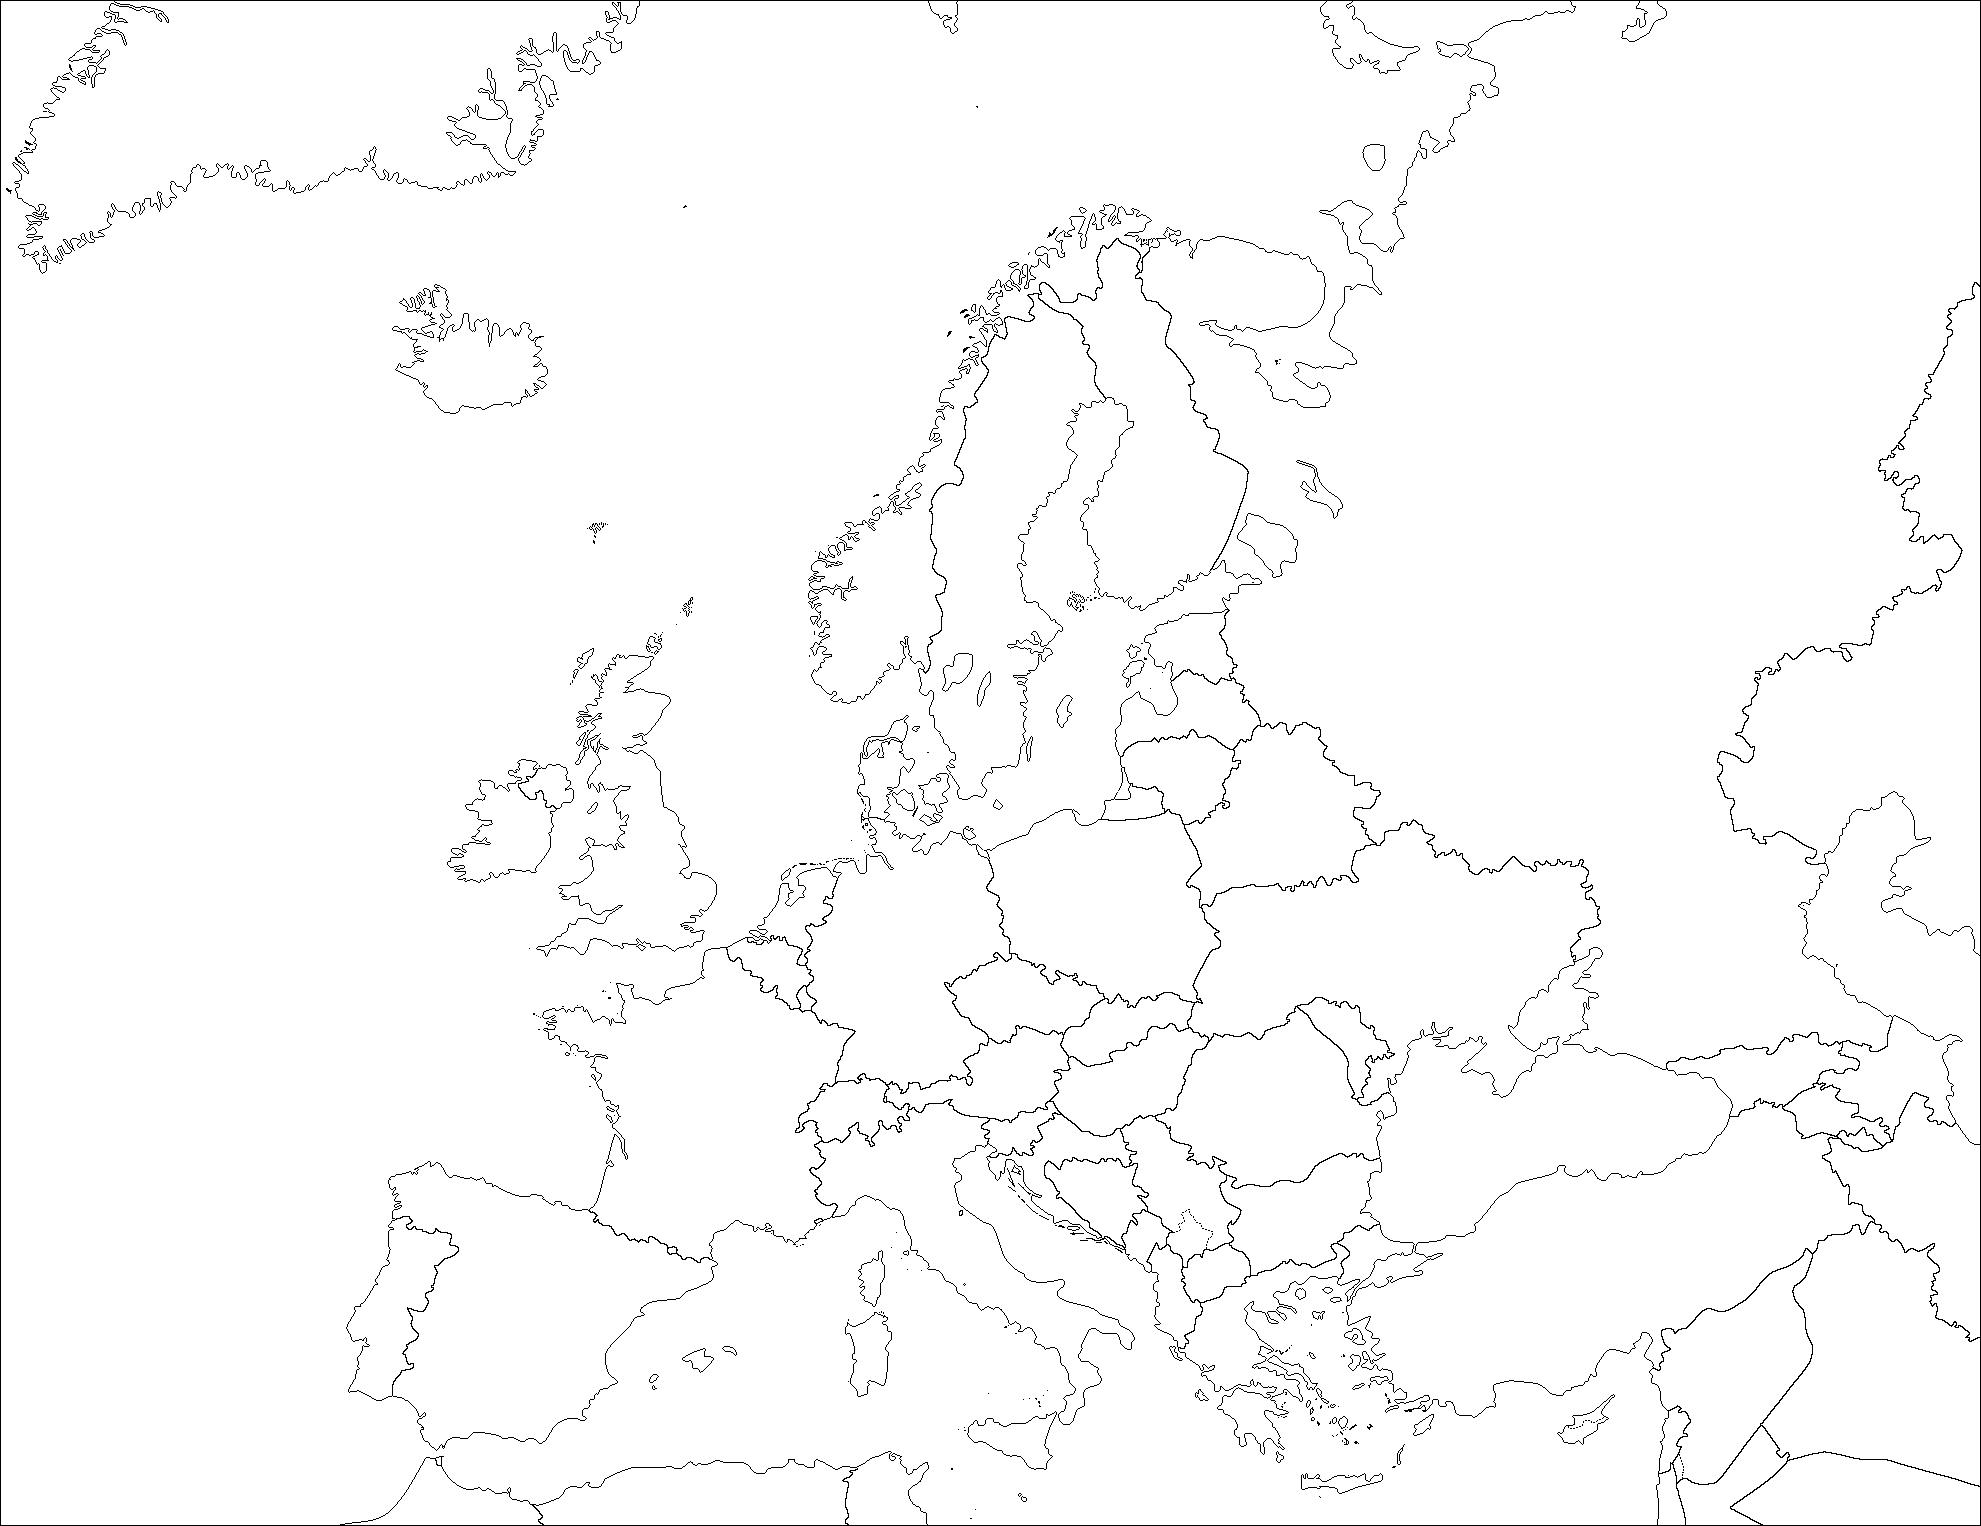 File:europe (Fond De Carte) - Wikimedia Commons dedans Union Européenne Carte Vierge